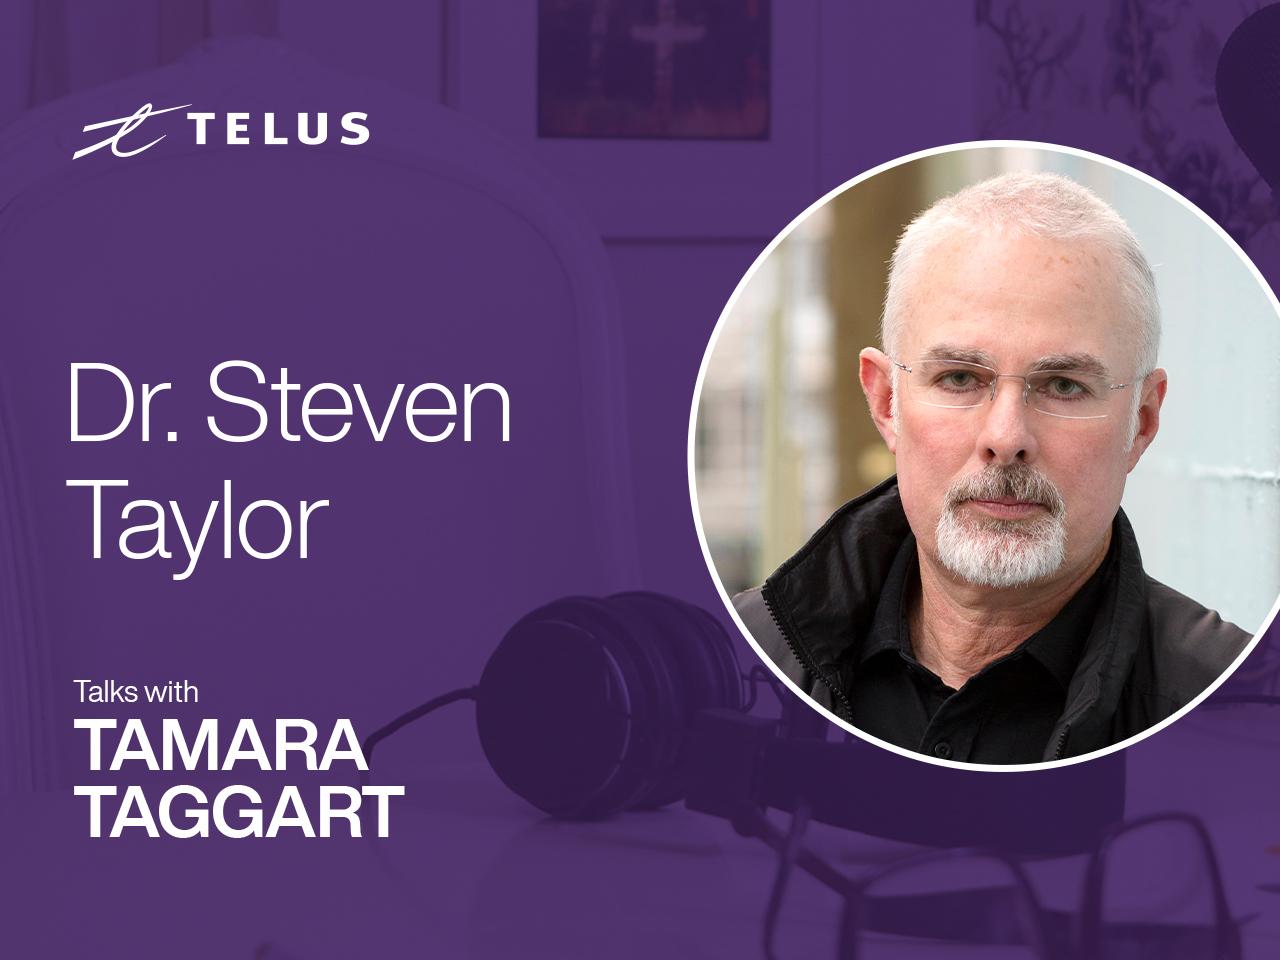 Psychologist and author Dr. Steven Taylor